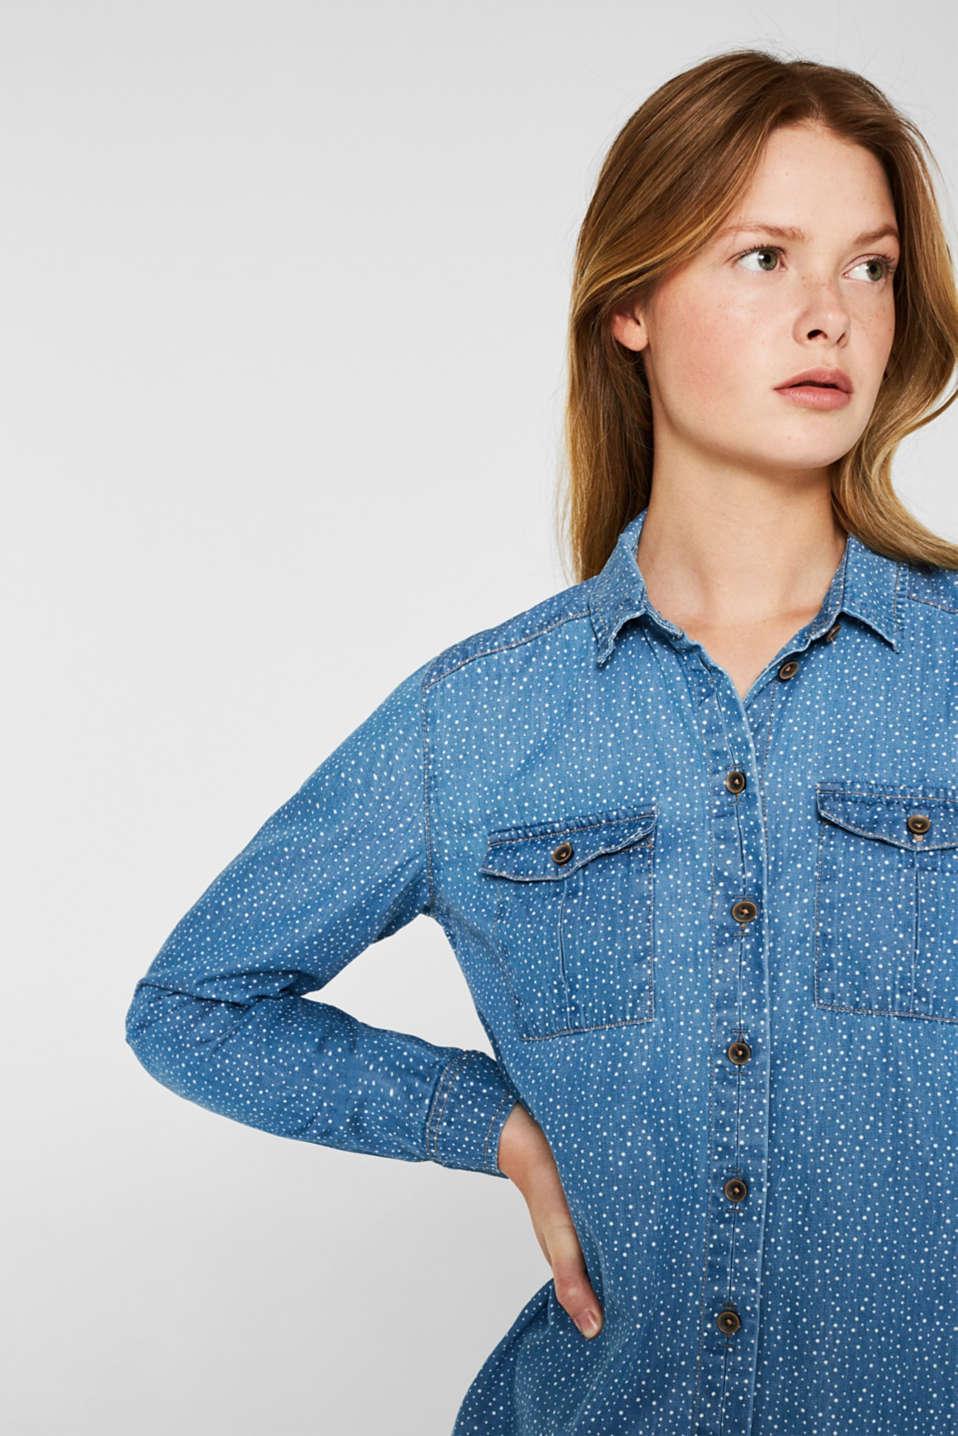 Printed denim blouse, 100% cotton, BLUE LIGHT WASH, detail image number 4